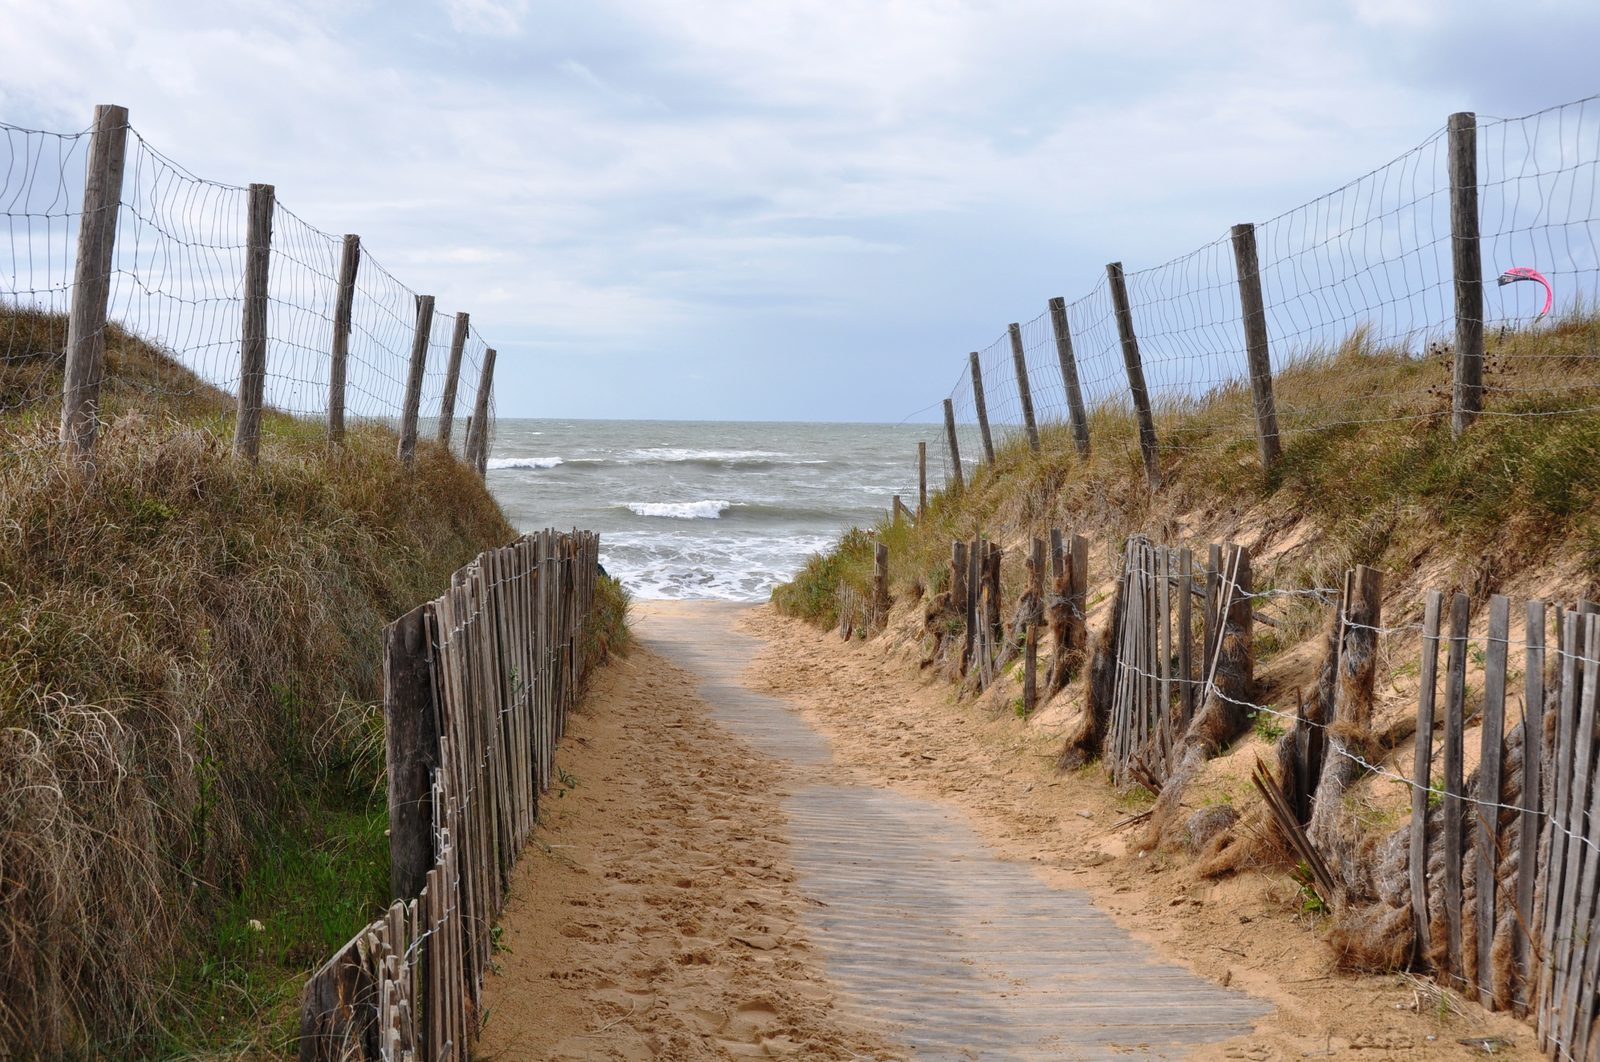 Vakantie, Frankrijk, Charente Maritime, Ile d'Oleron, strand